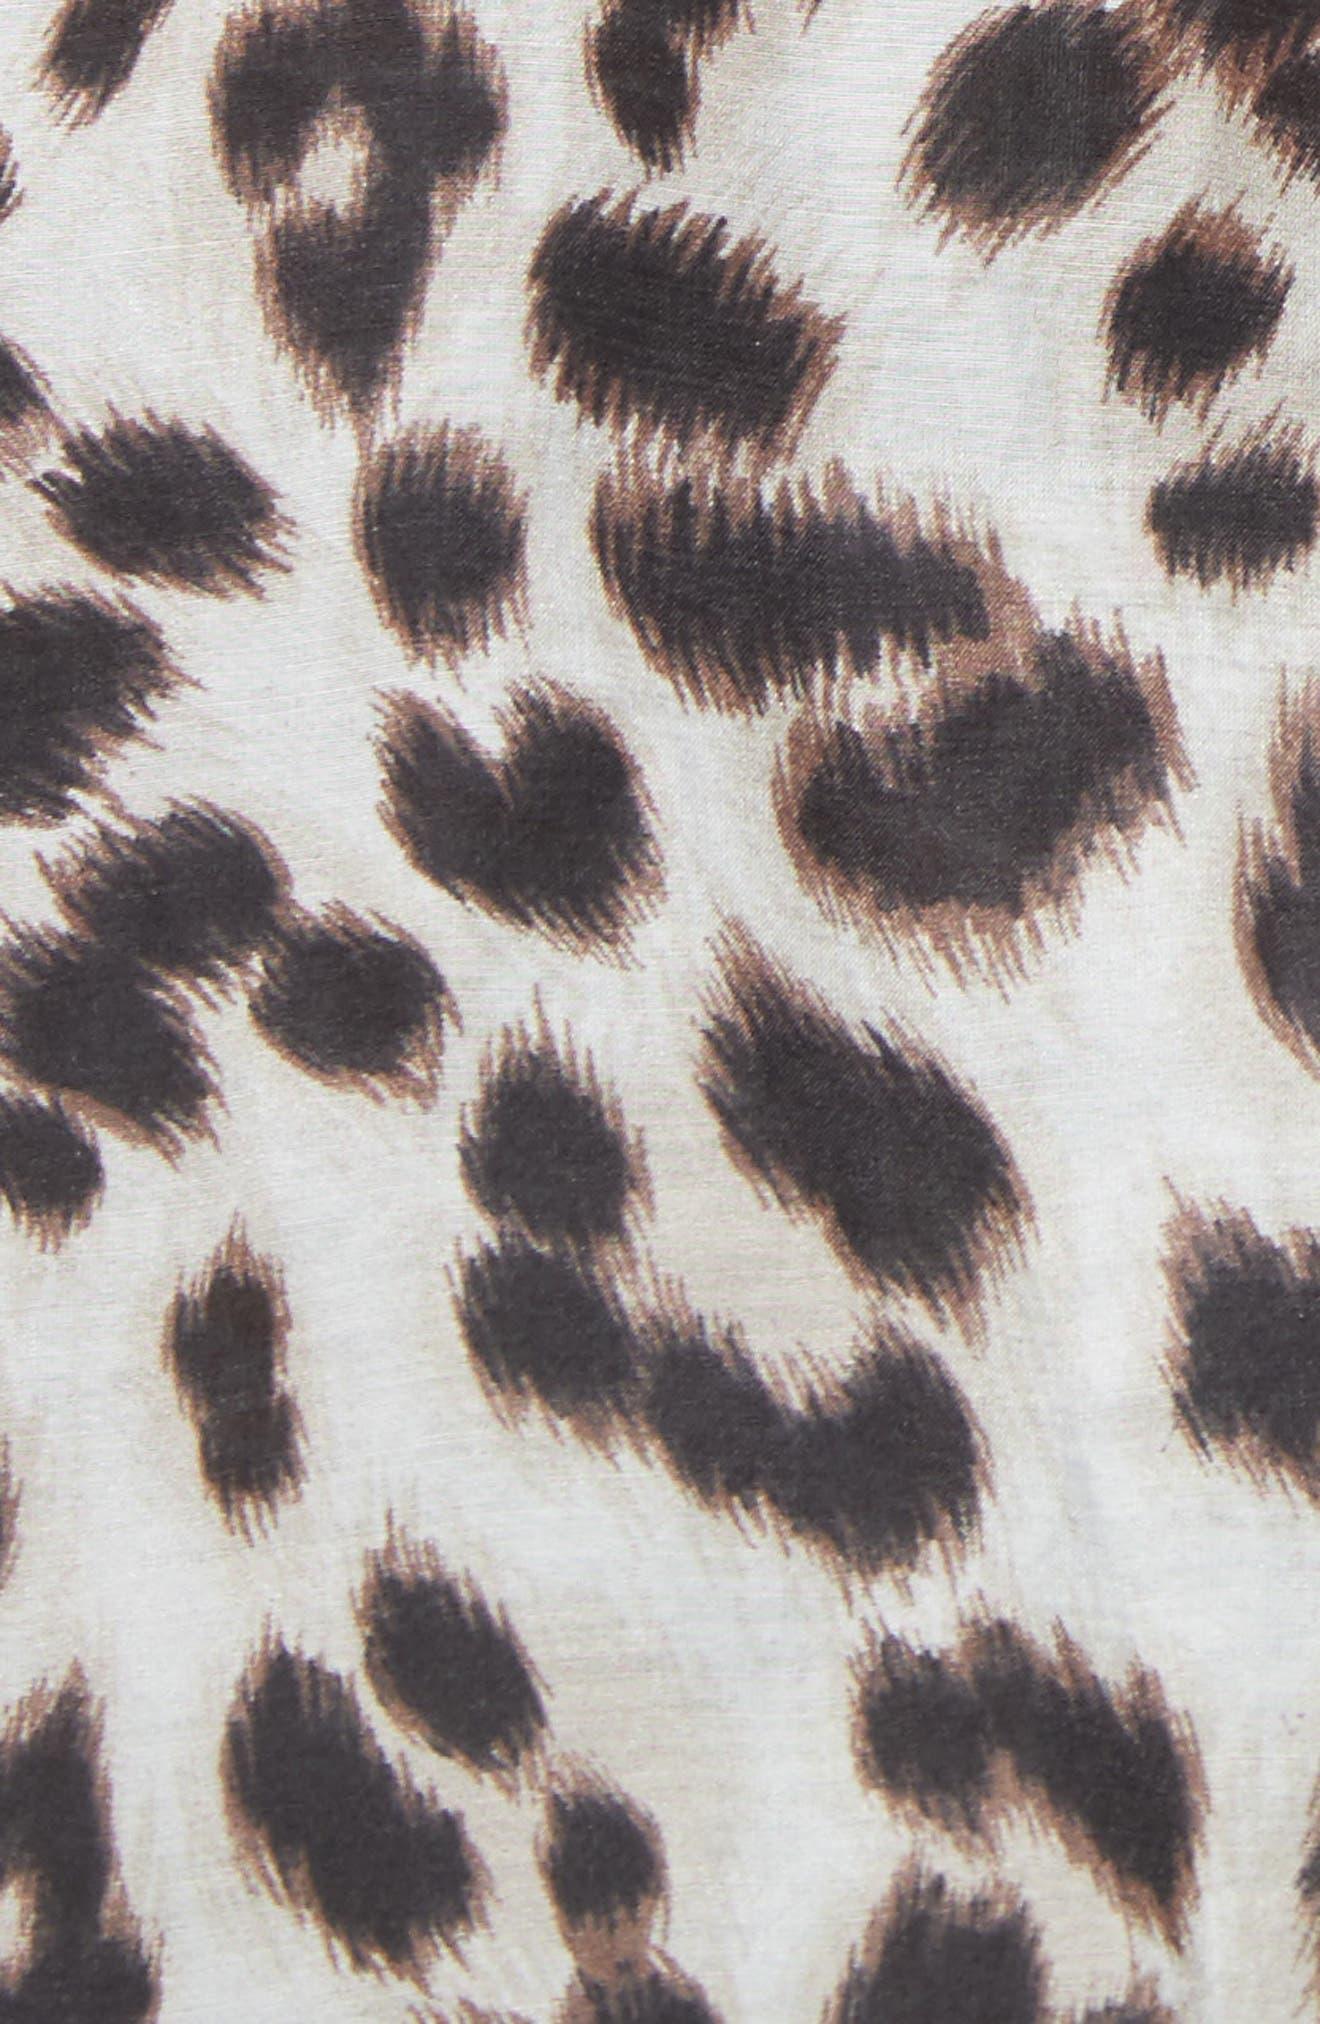 Daddy Leopard Print Blouse,                             Alternate thumbnail 5, color,                             Bright White Multi